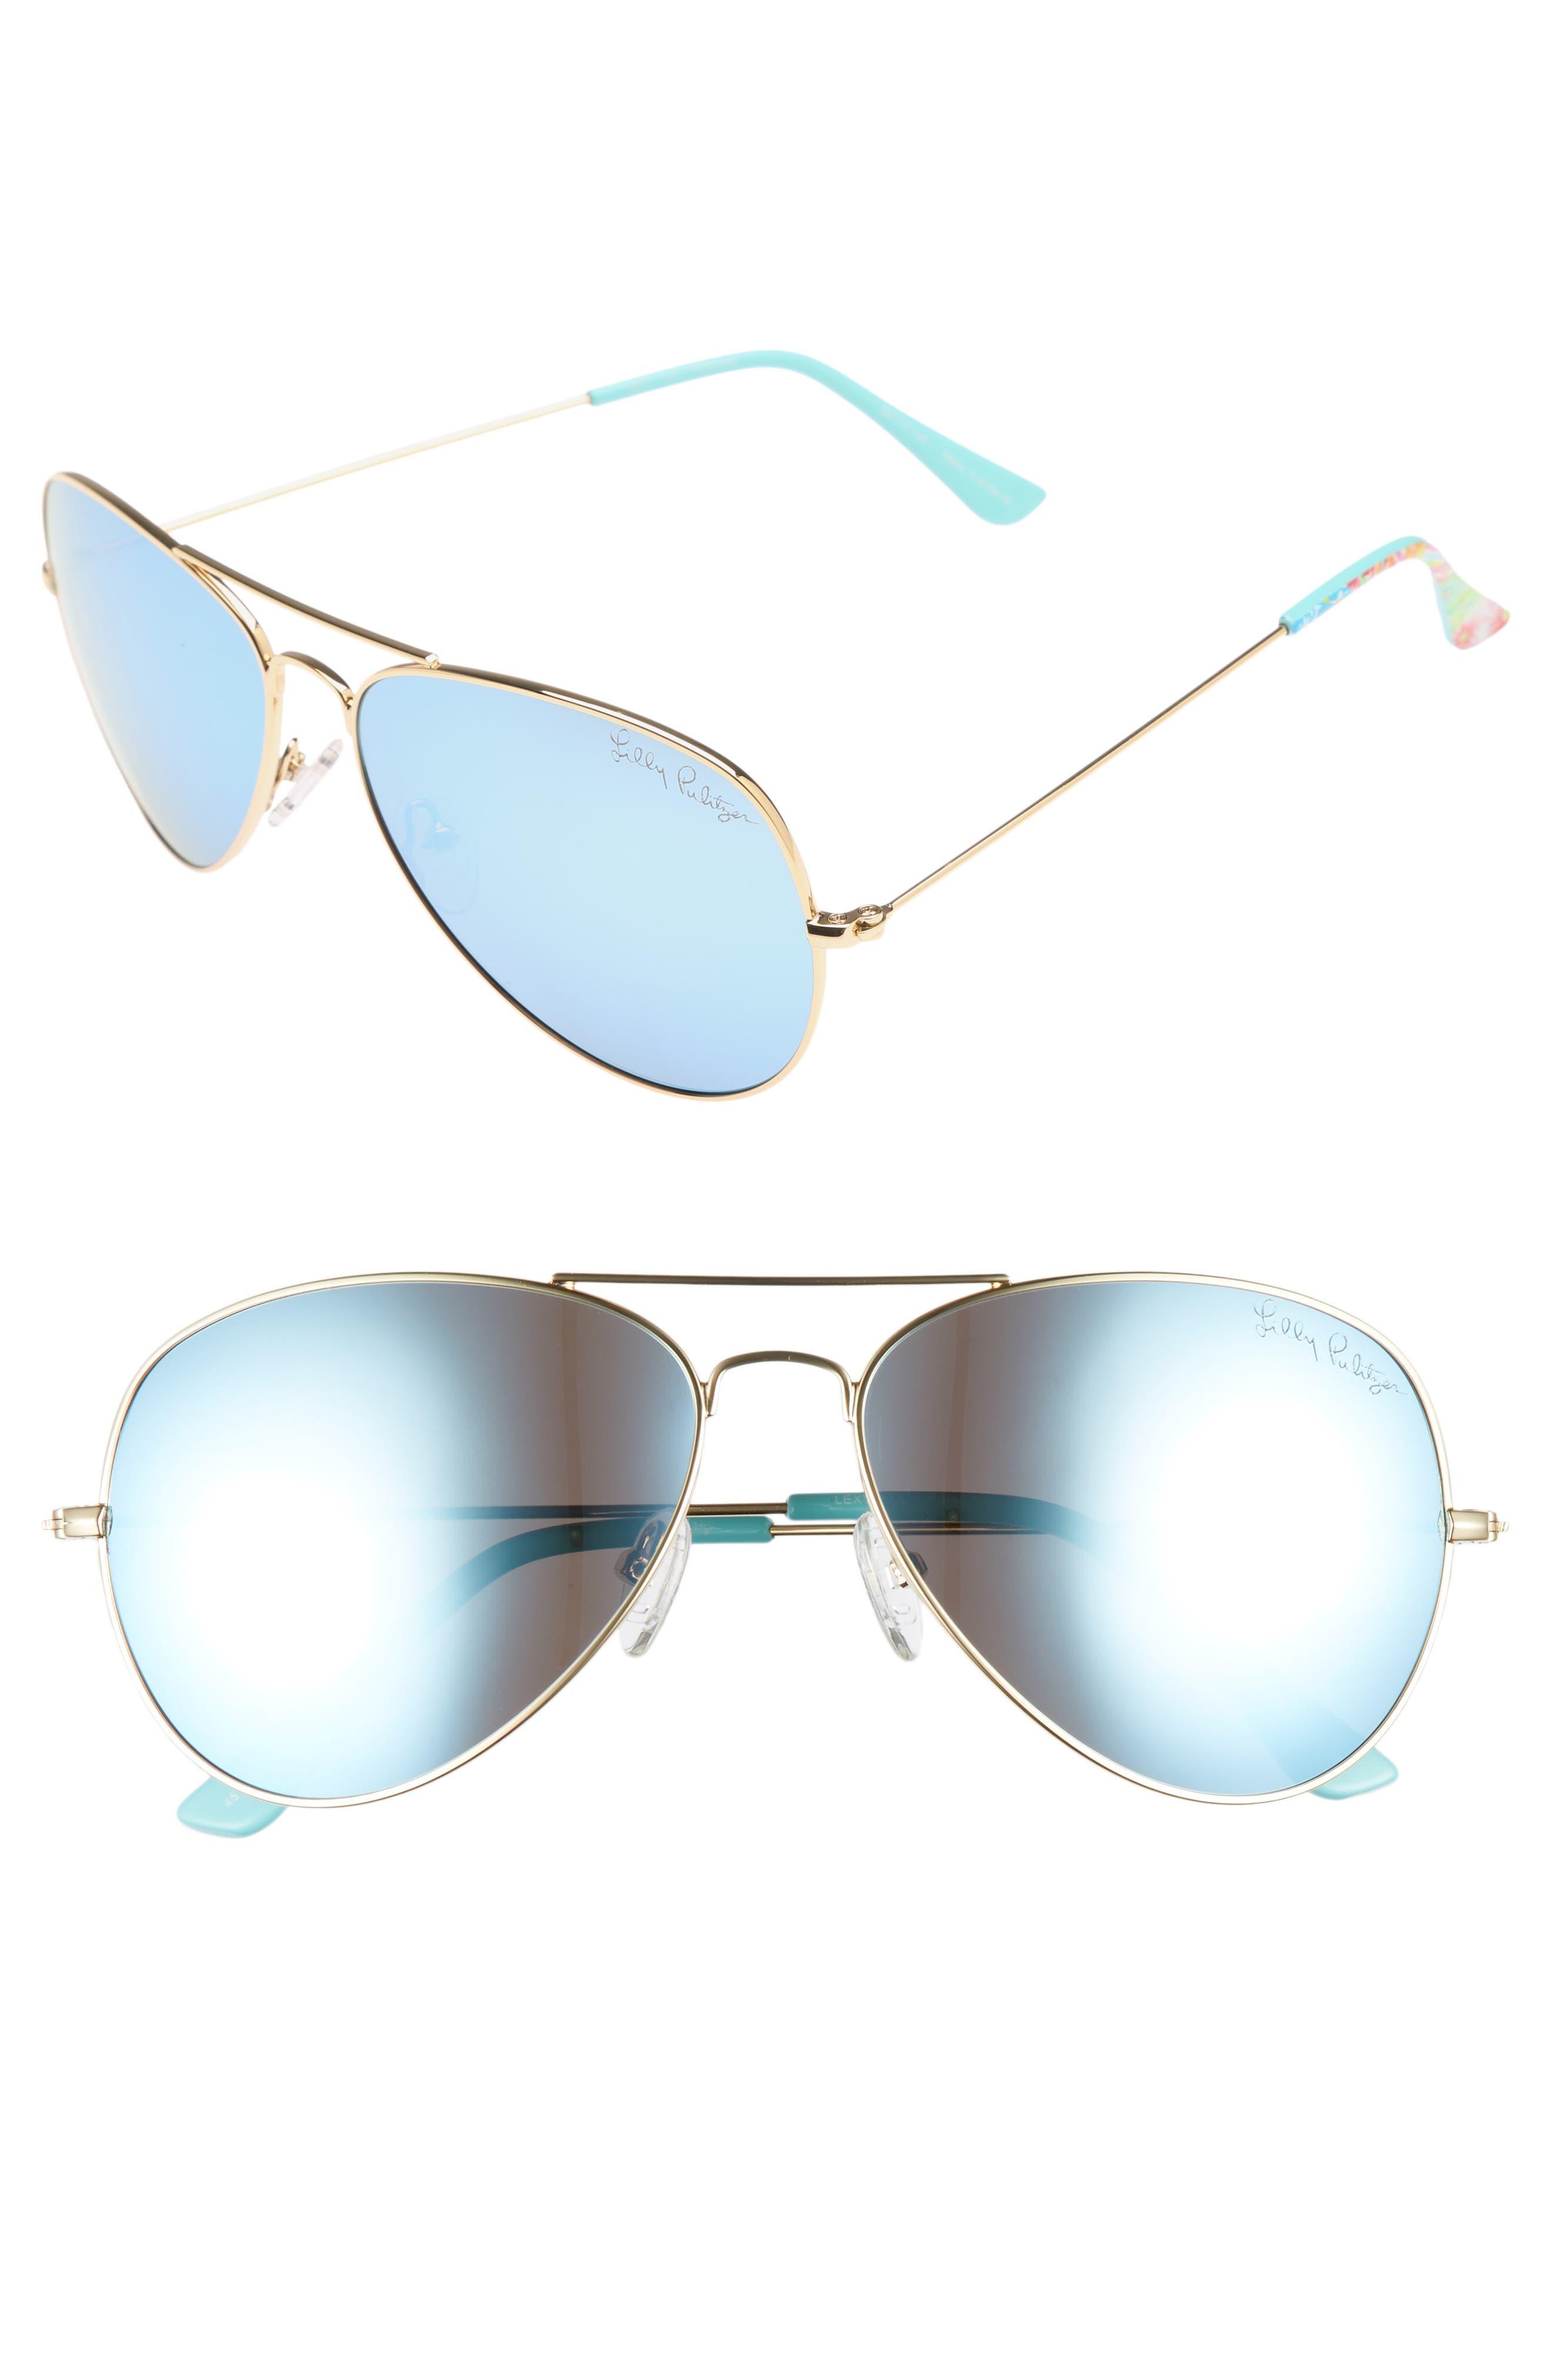 Lexy 59mm Polarized Aviator Sunglasses,                         Main,                         color, BLUE 2